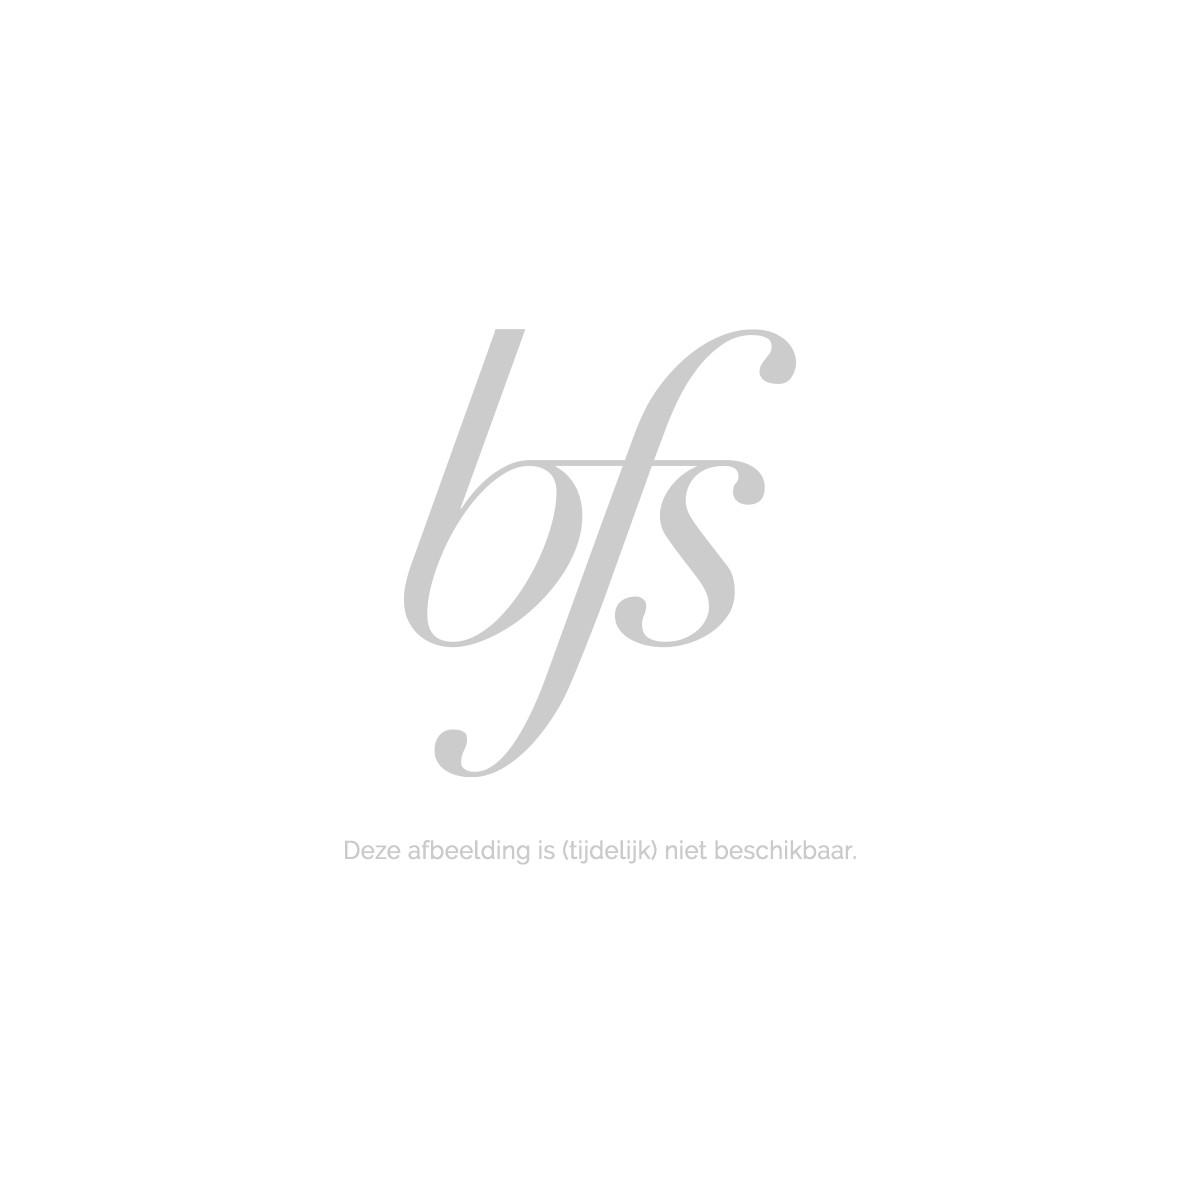 Afbeelding van Dermalogica Barrier Repair Dagcrèmes Beauty